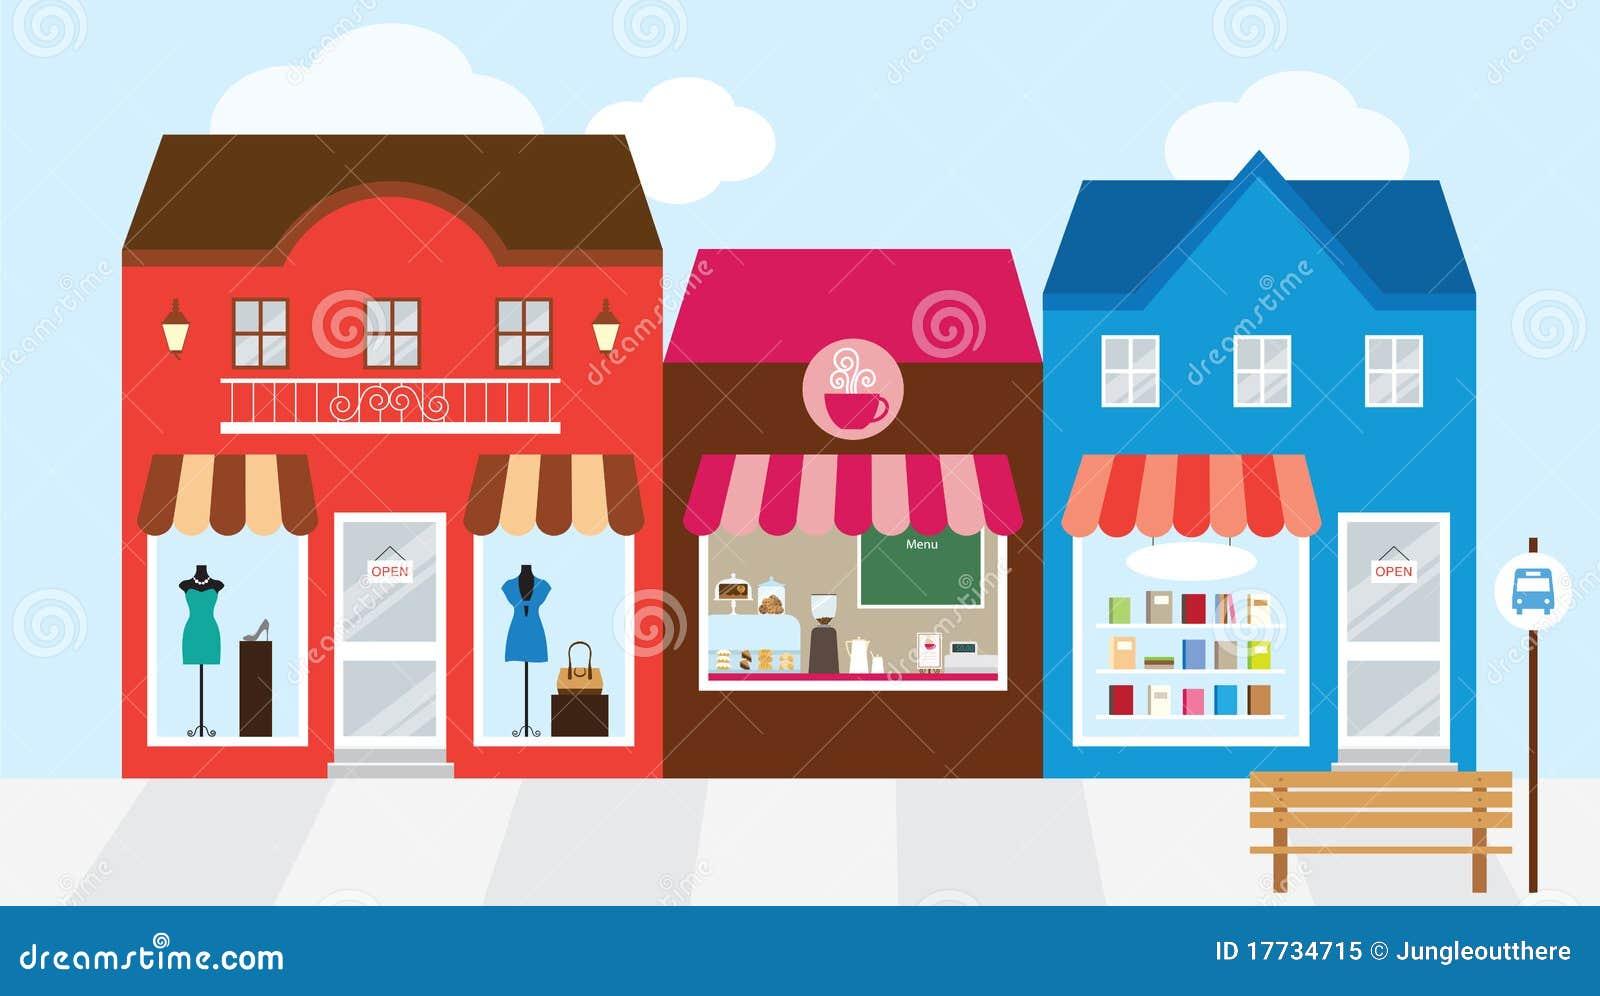 retail store clip art free - photo #38